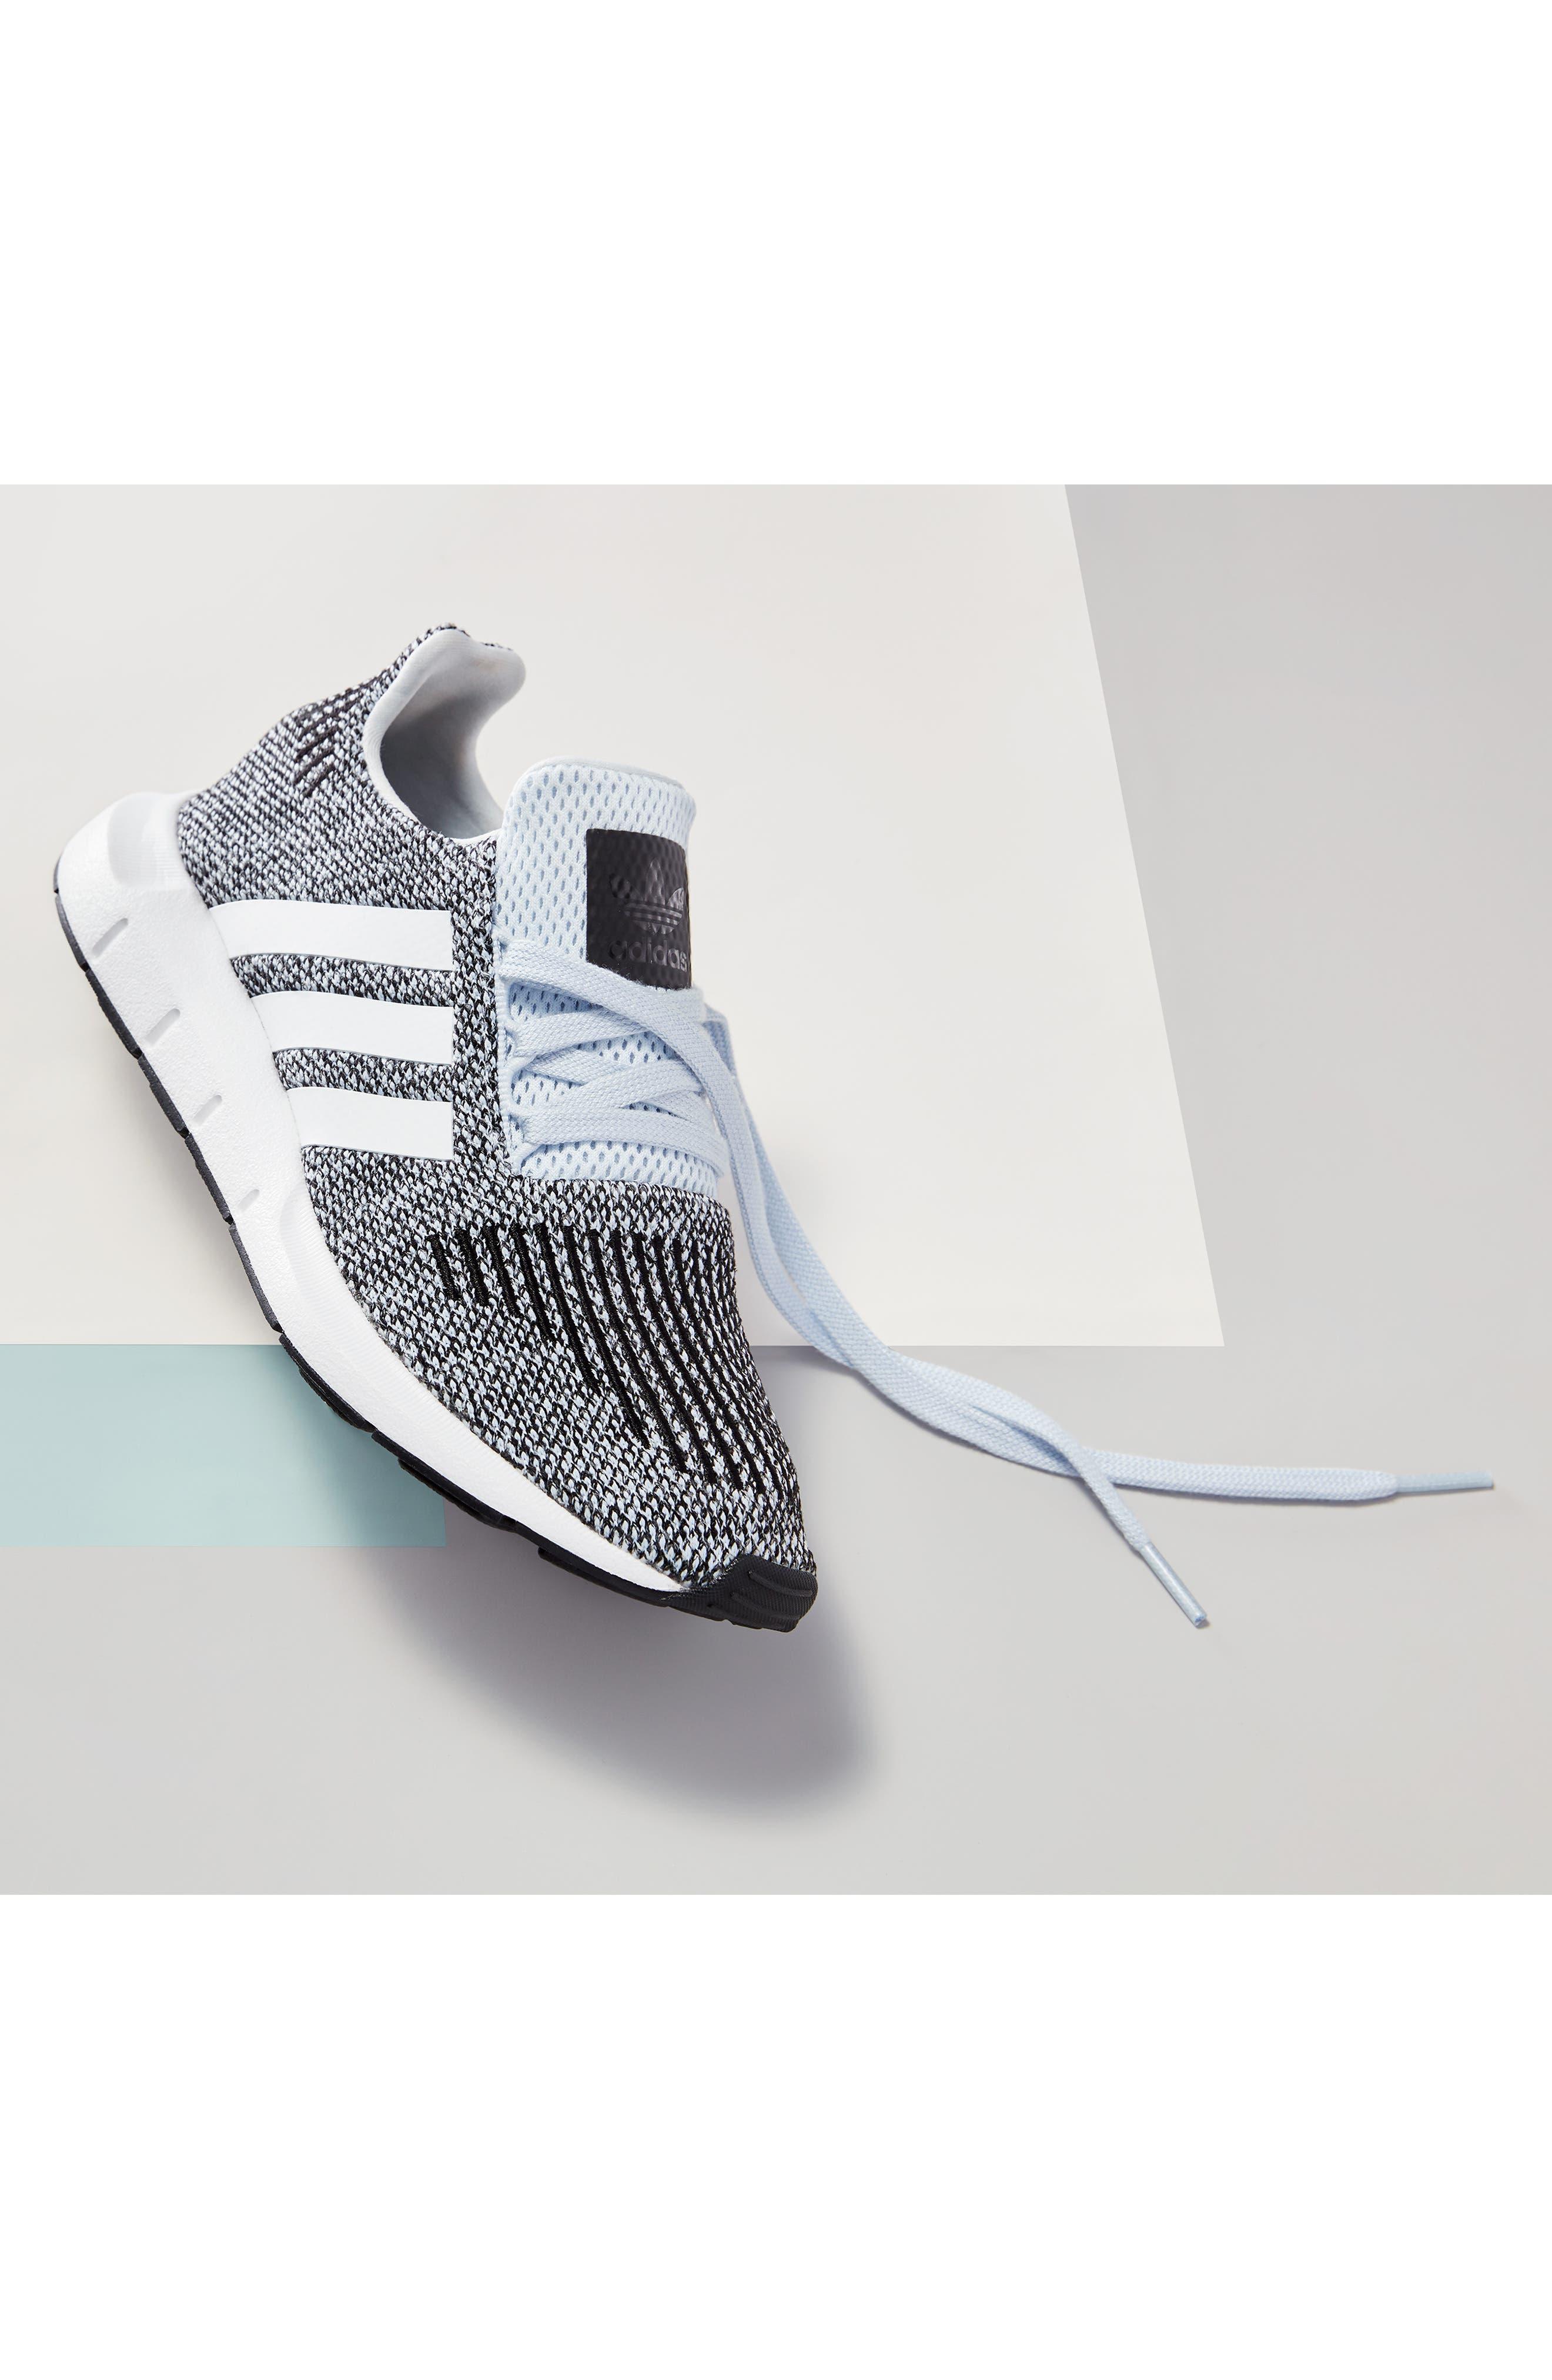 Swift Run J Sneaker,                             Alternate thumbnail 12, color,                             SEMI SOLAR PINK/ WHITE